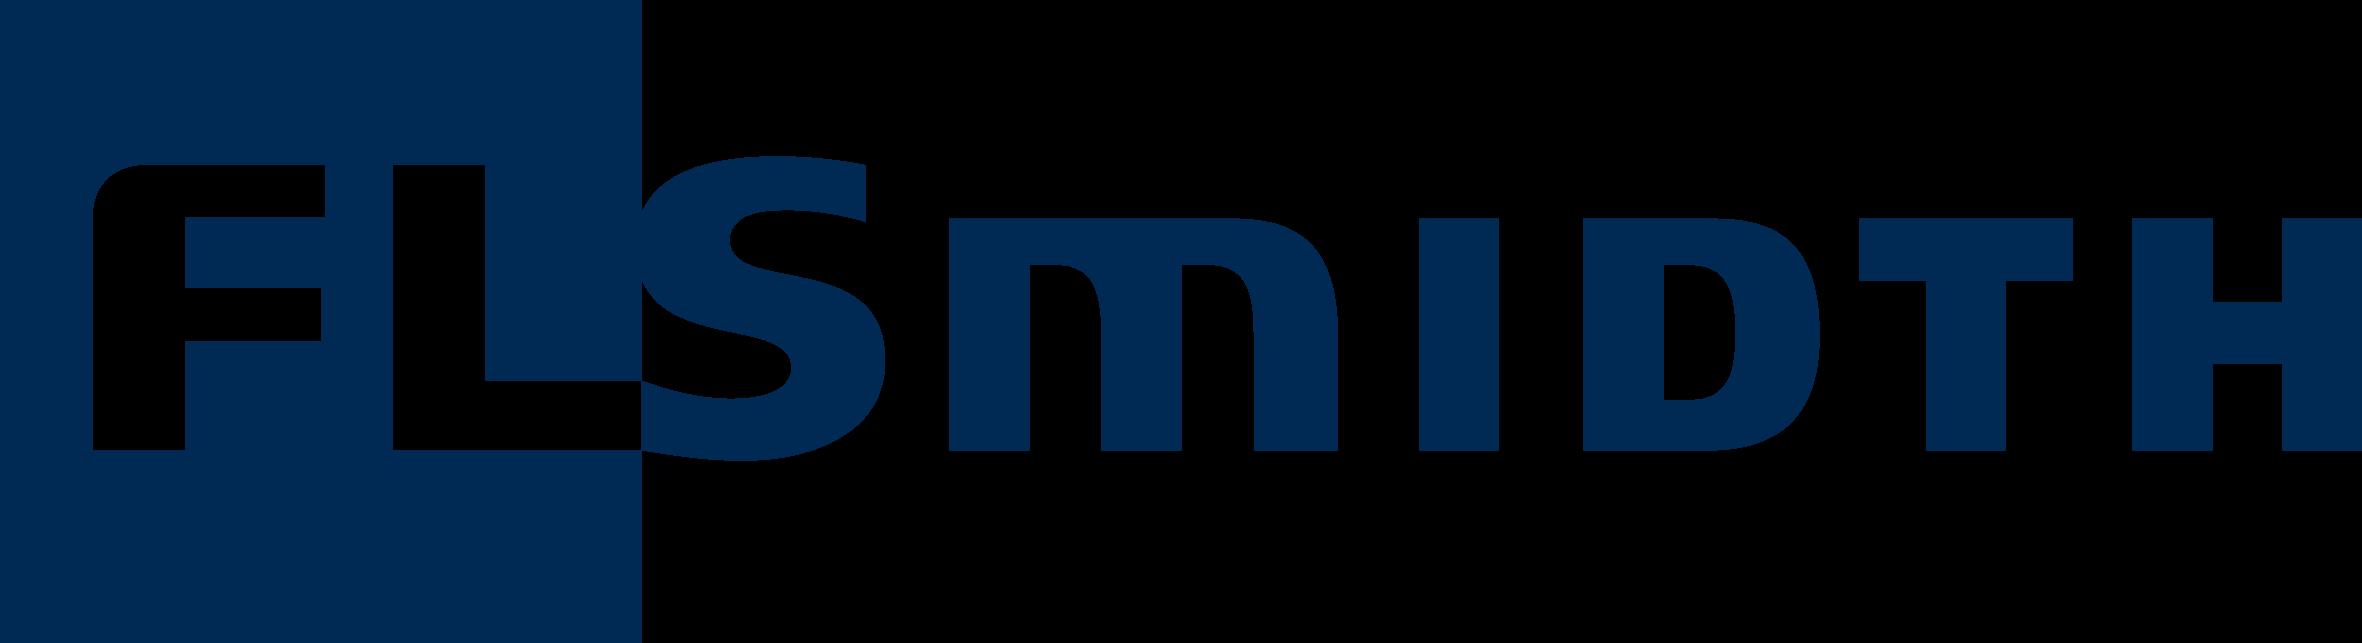 FLSmidth_logo_RGB_blue_transparency